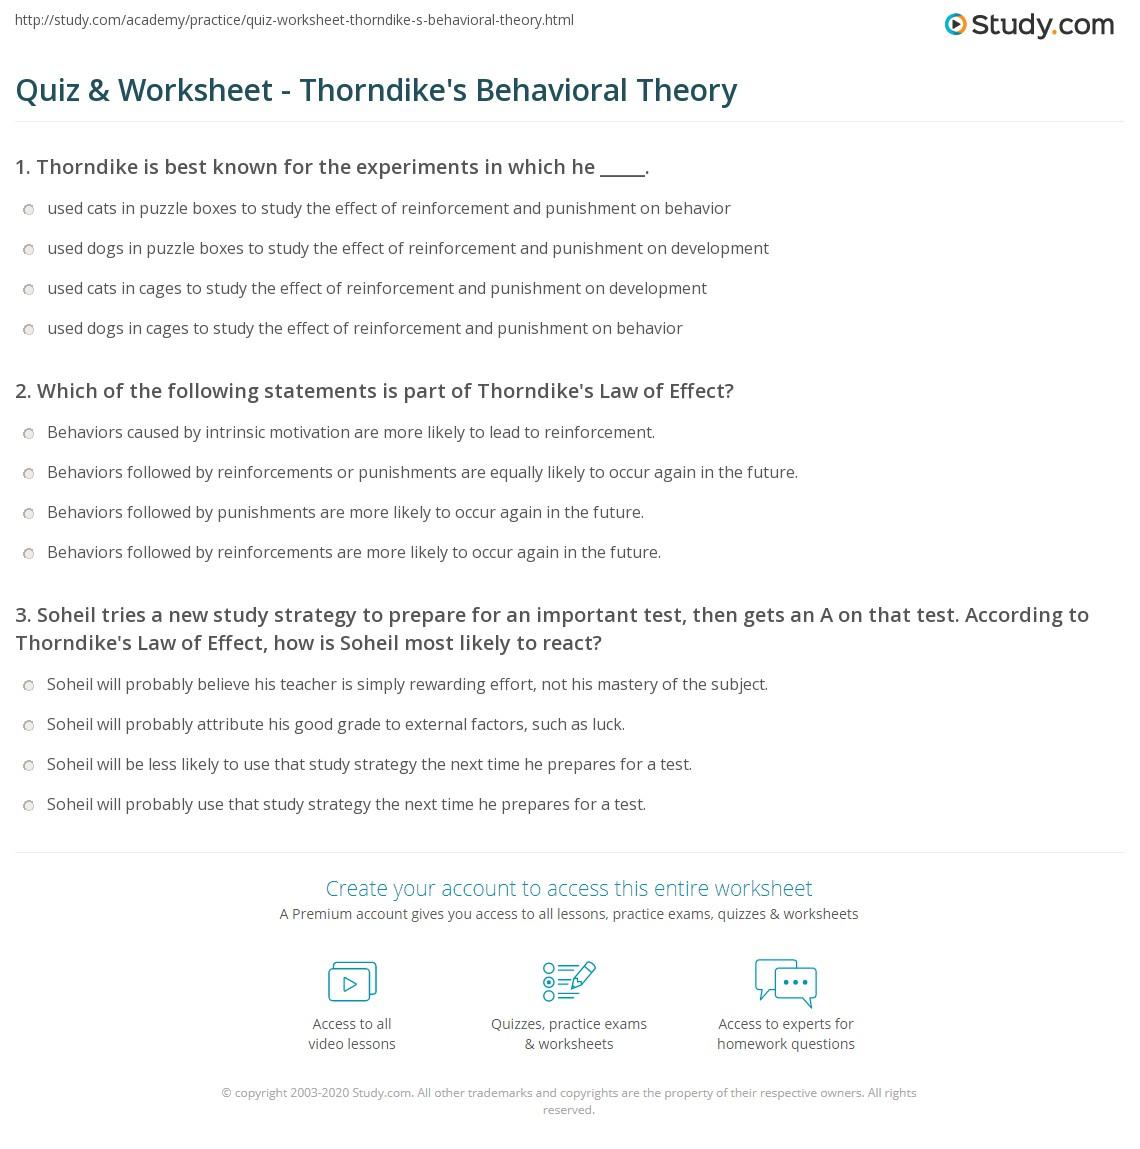 Workbooks hindi gender worksheets : Quiz & Worksheet - Thorndike's Behavioral Theory | Study.com